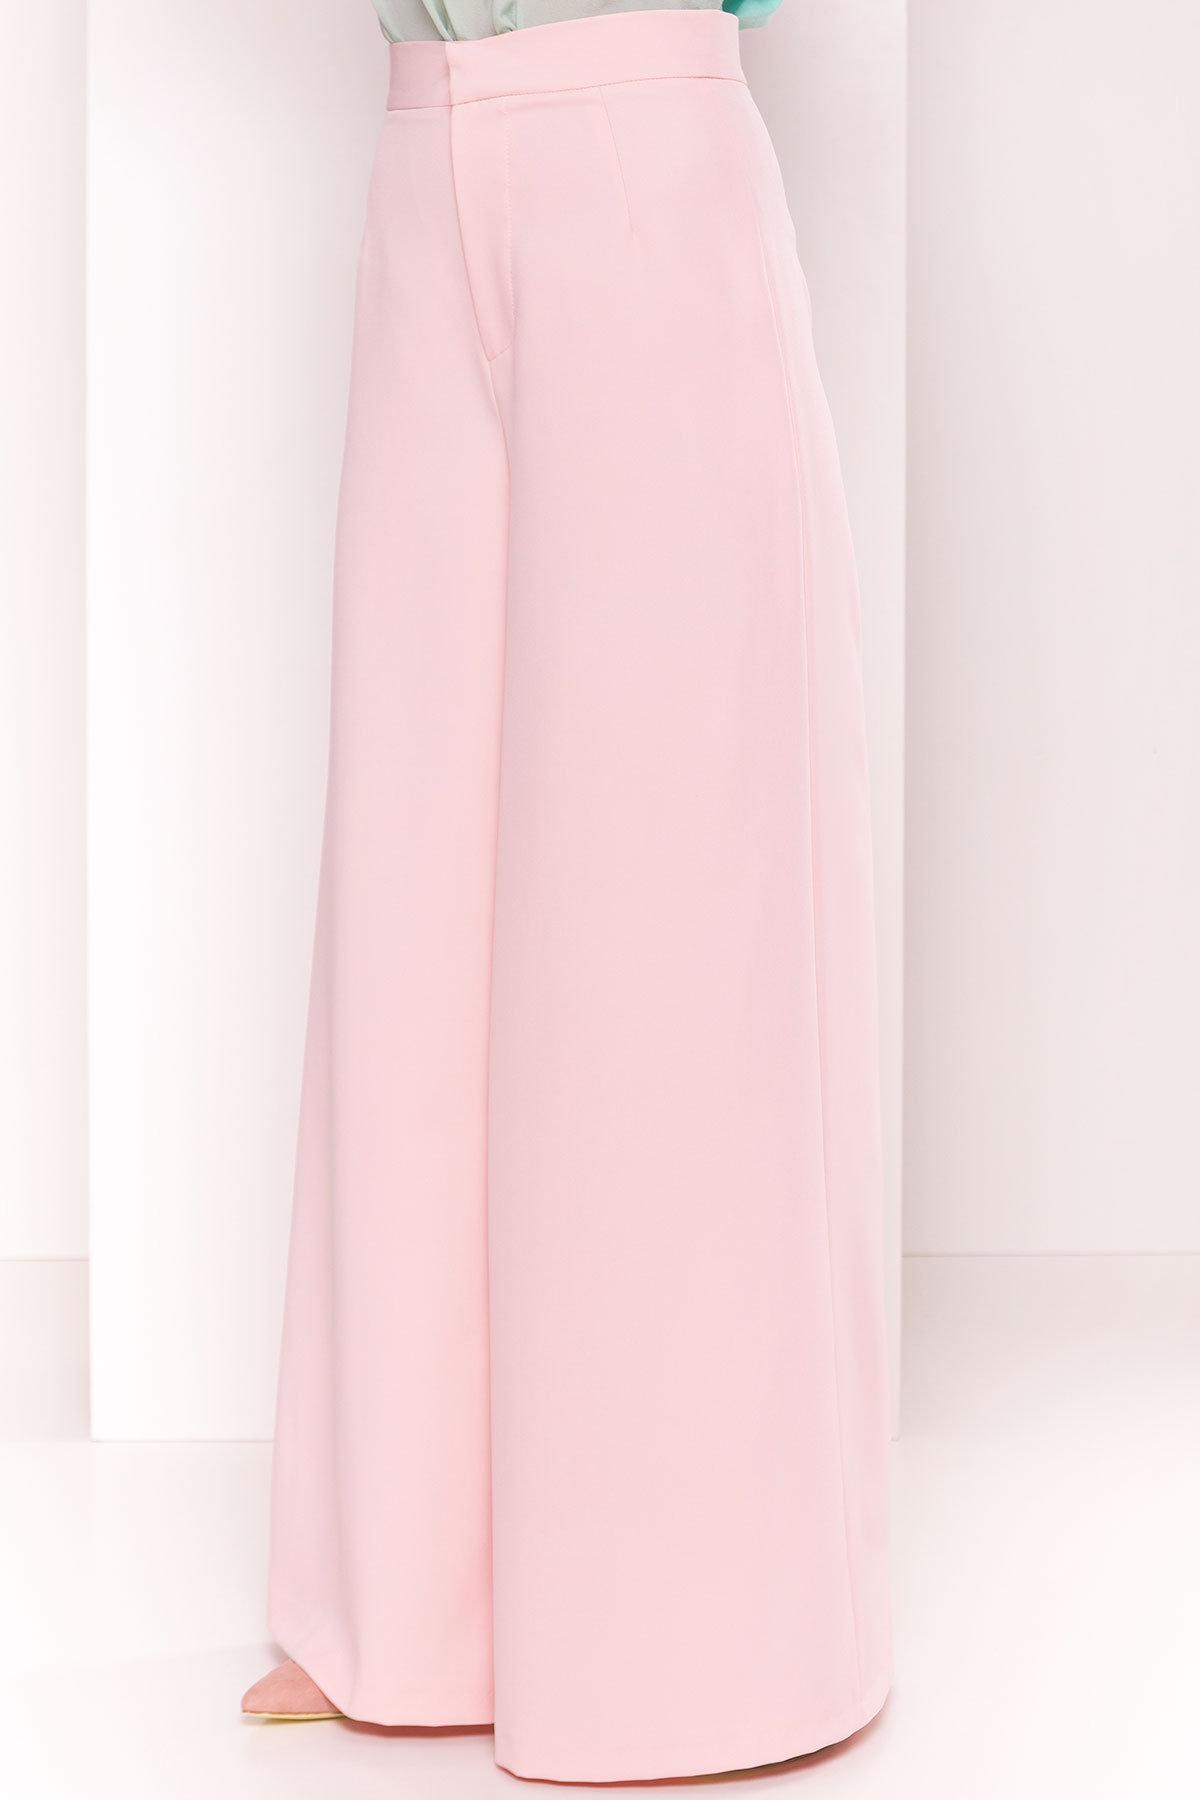 Широкие Брюки Мадлен 2788 Цвет: Розовый